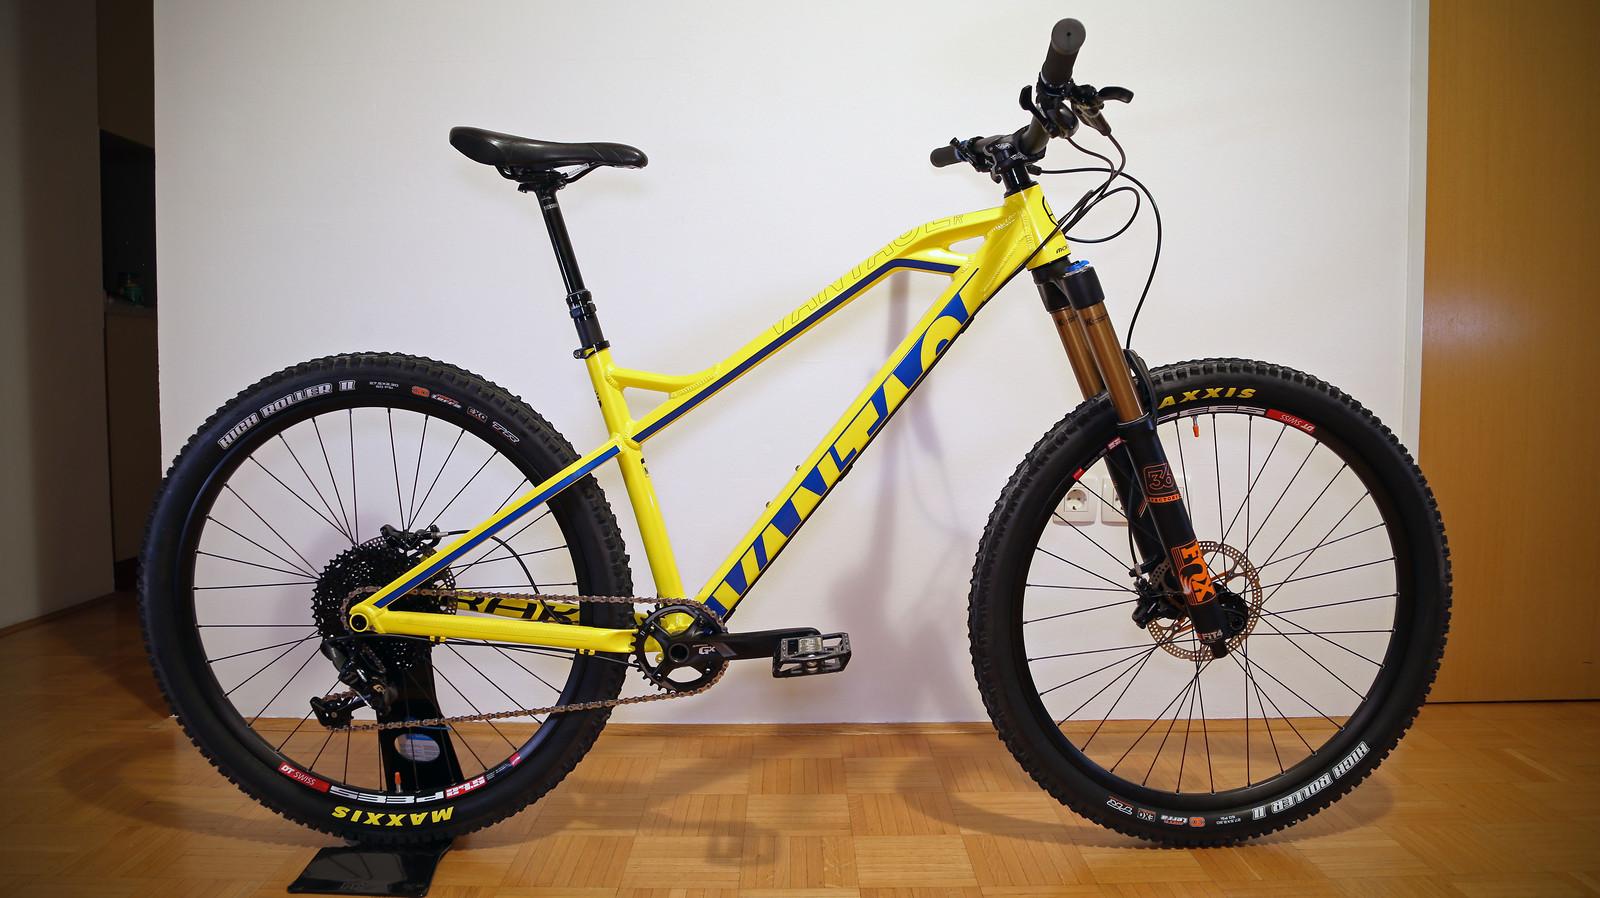 Mondraker Vantage R custom bike - porson - Mountain Biking Pictures - Vital MTB